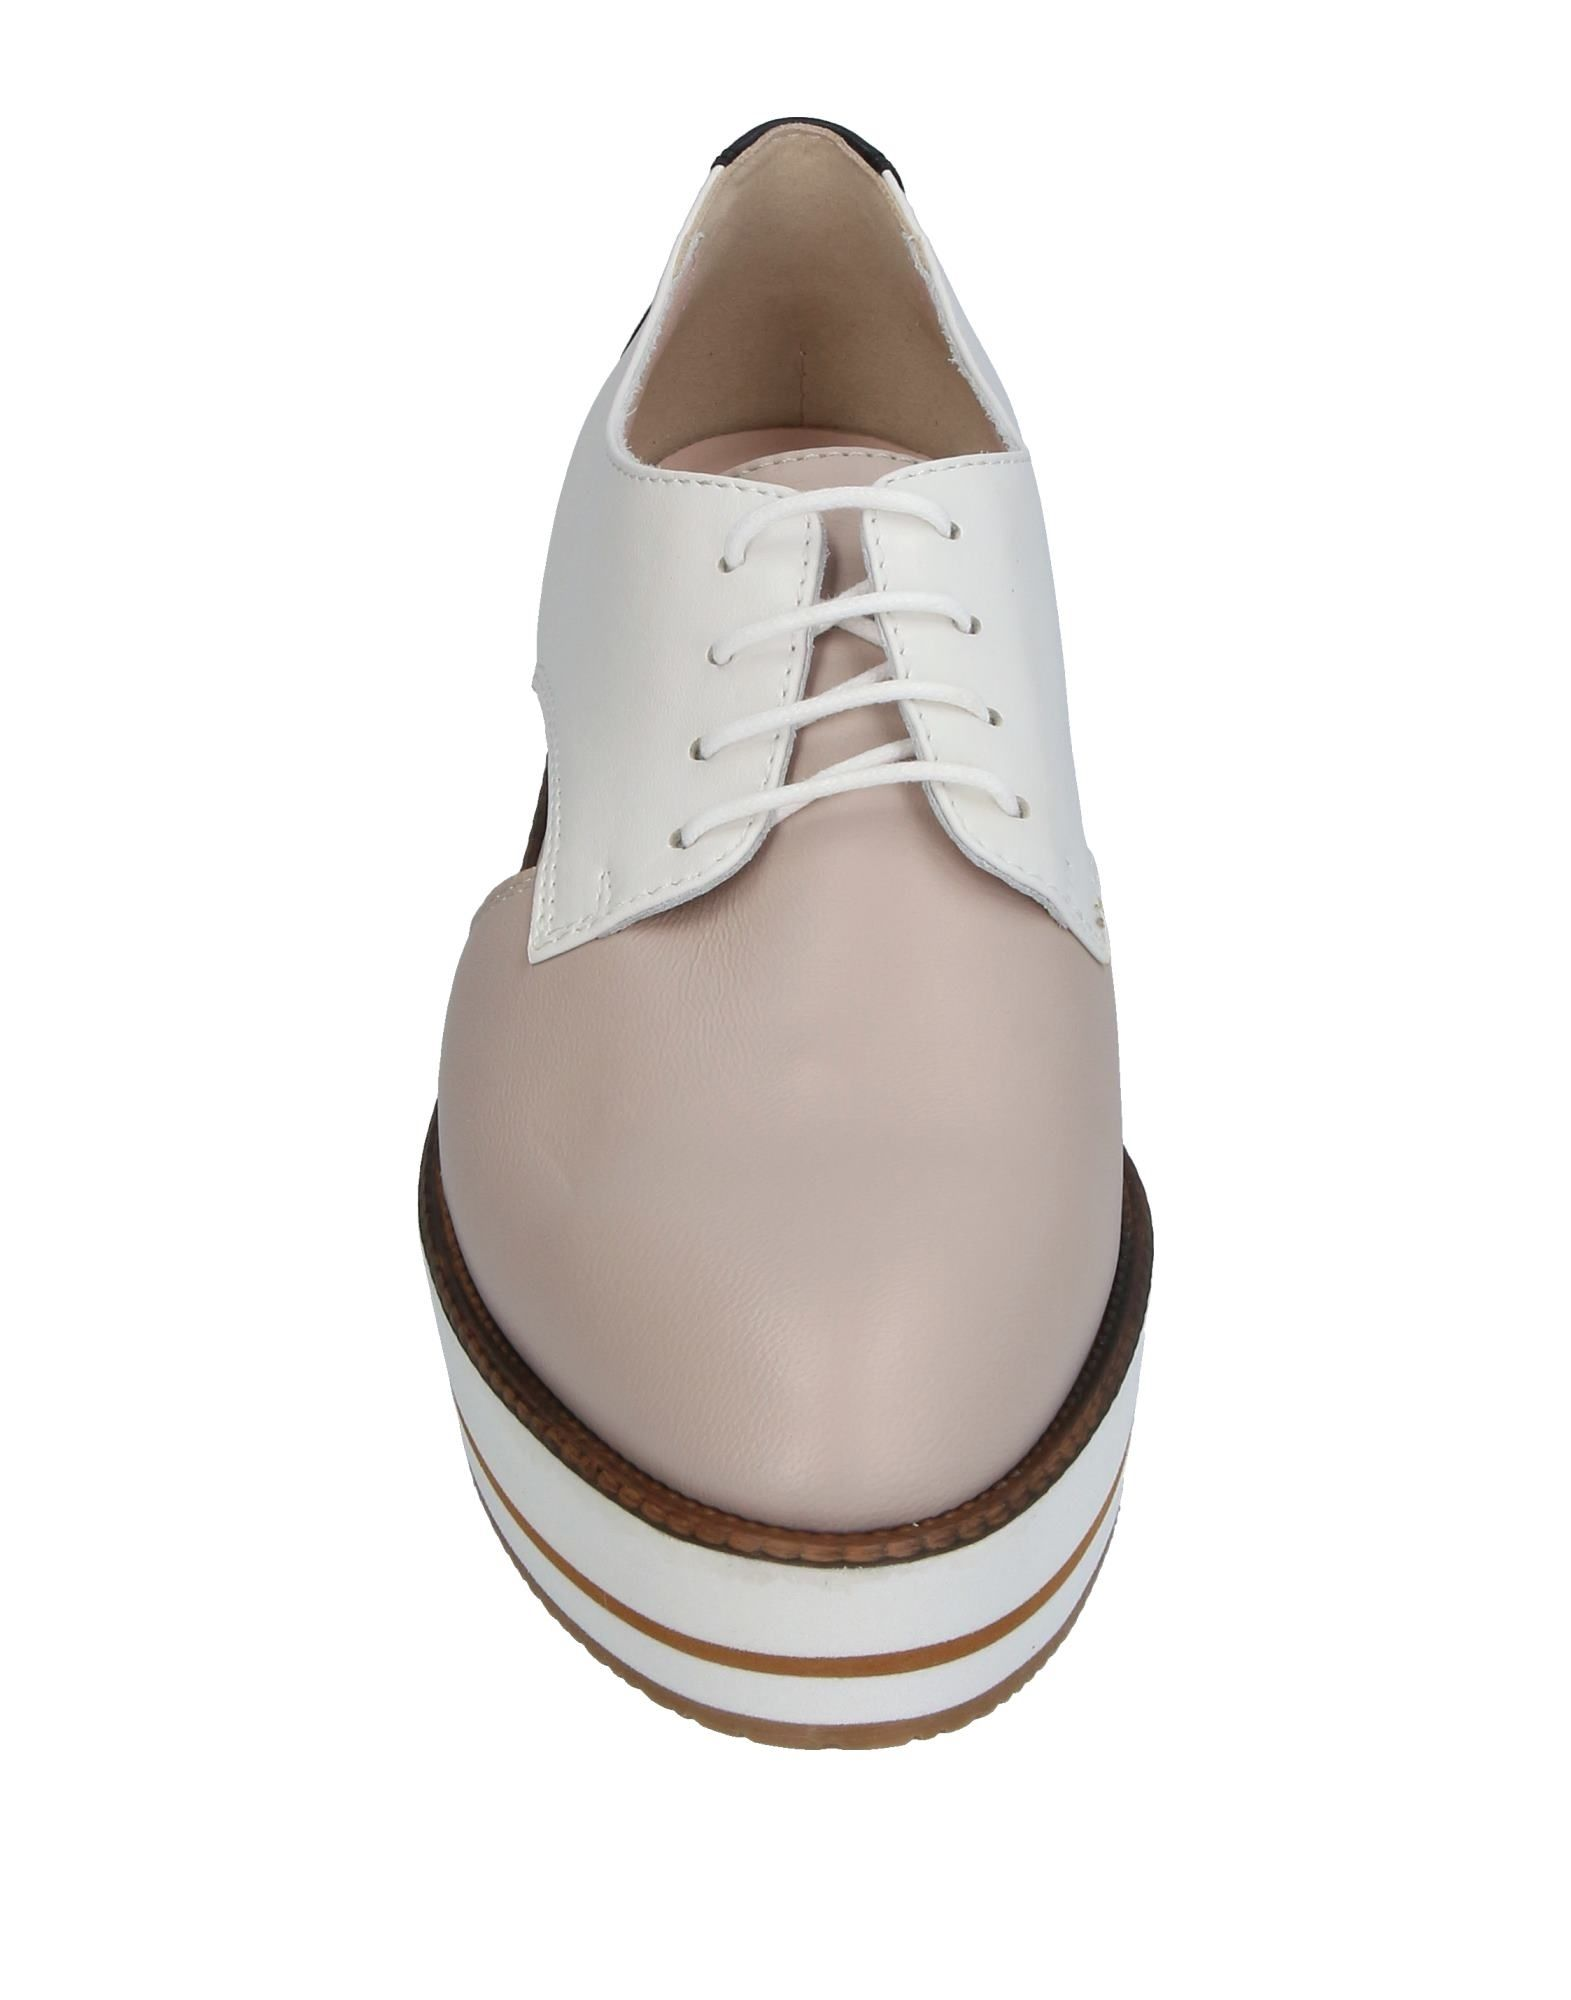 Tosca Blu Schuhes Schnürschuhe Damen 11326375PP Gute Gute Gute Qualität beliebte Schuhe 212aae